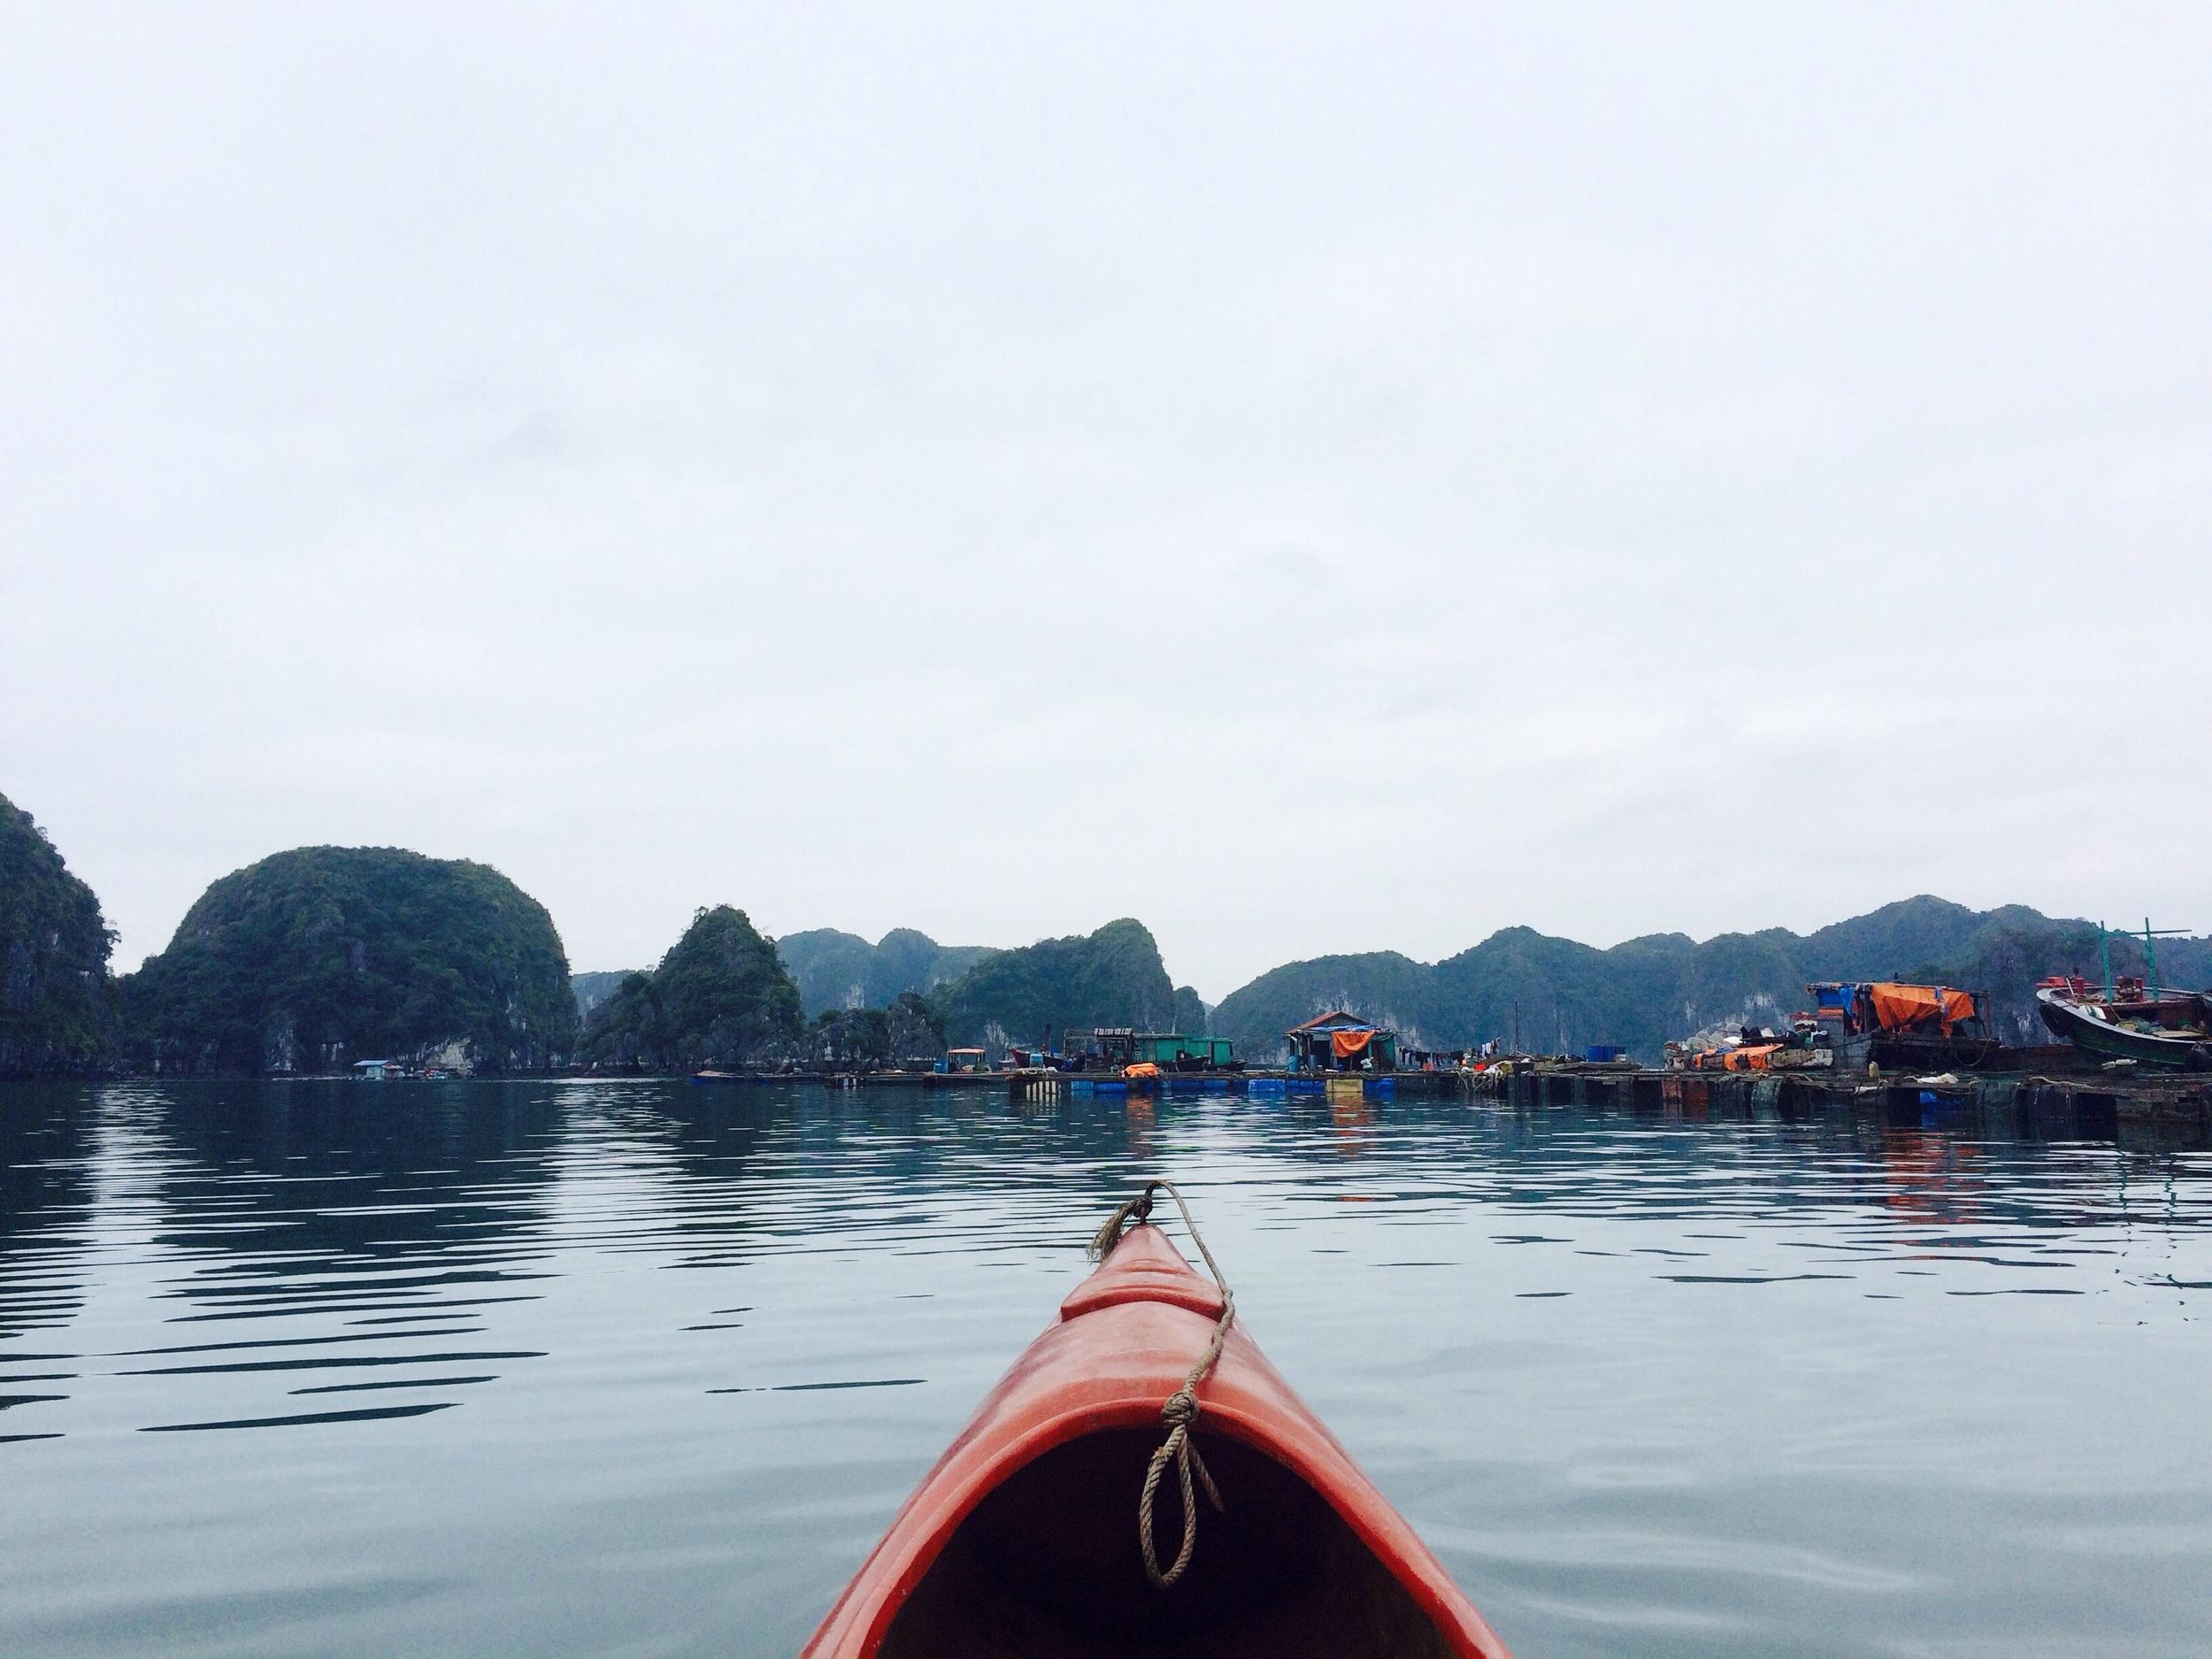 The floating fishing villages of Bai Tu Long Bay